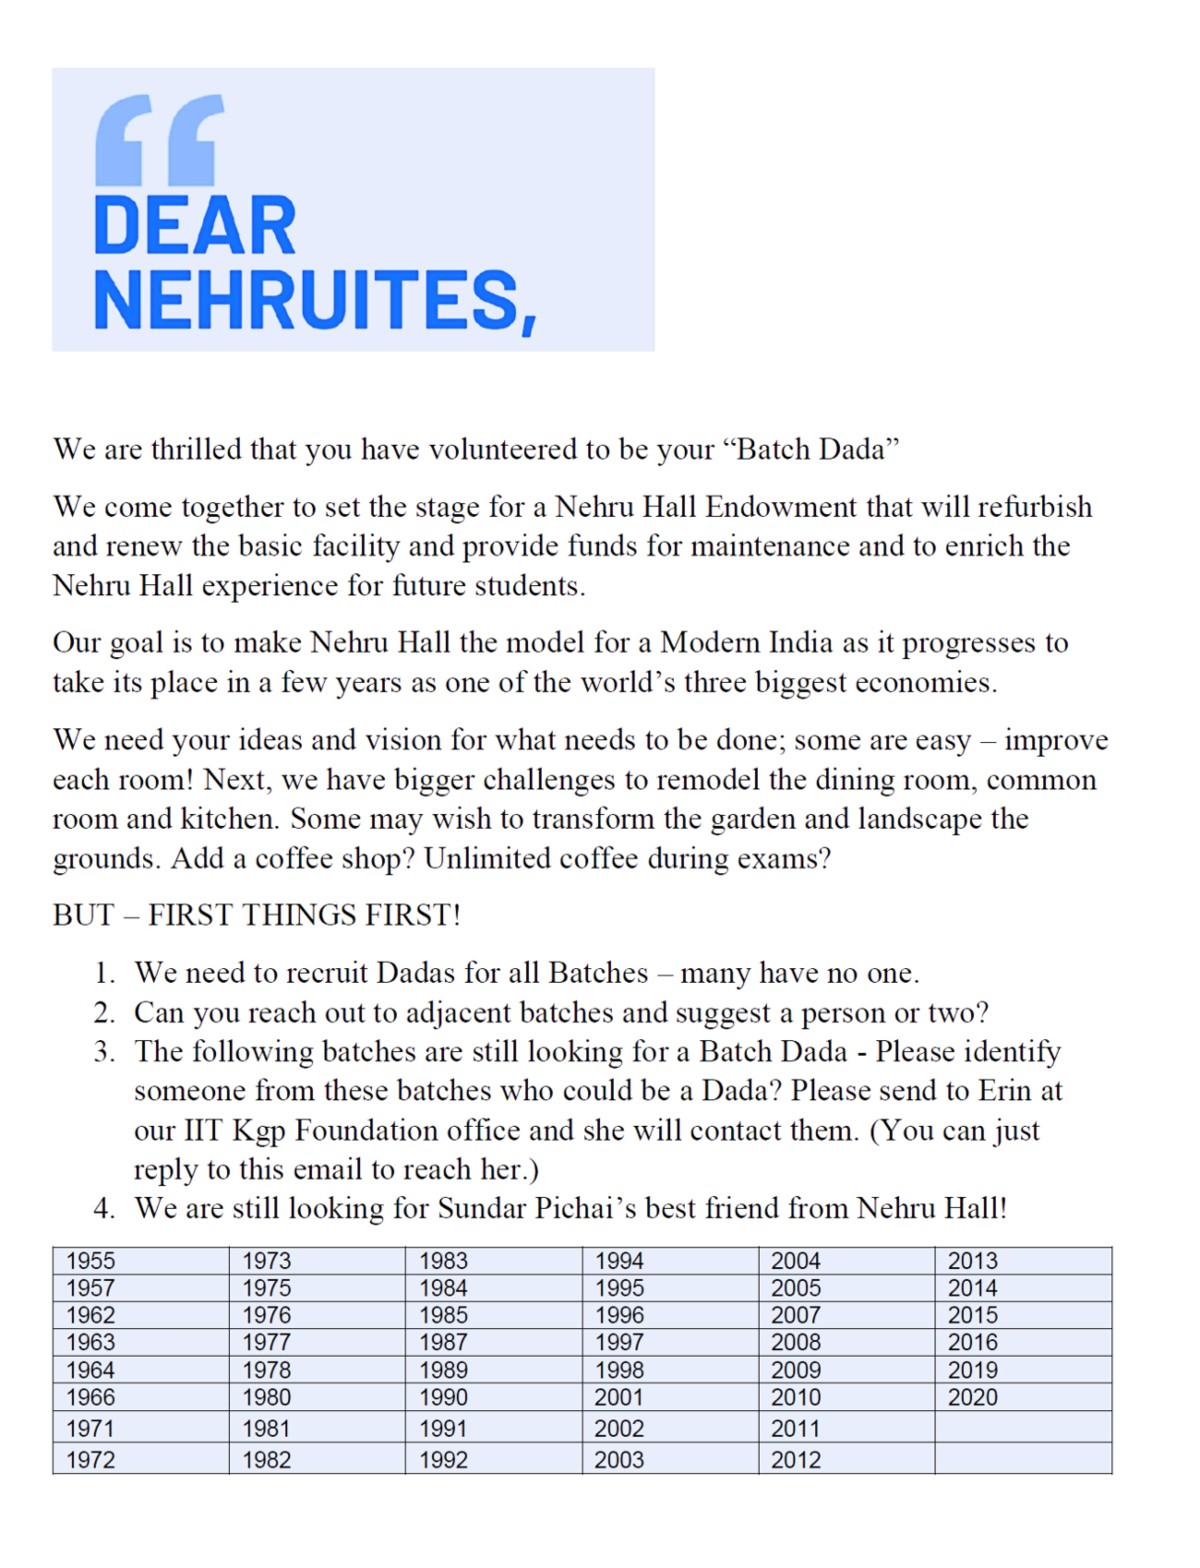 nehruite-champions-letter